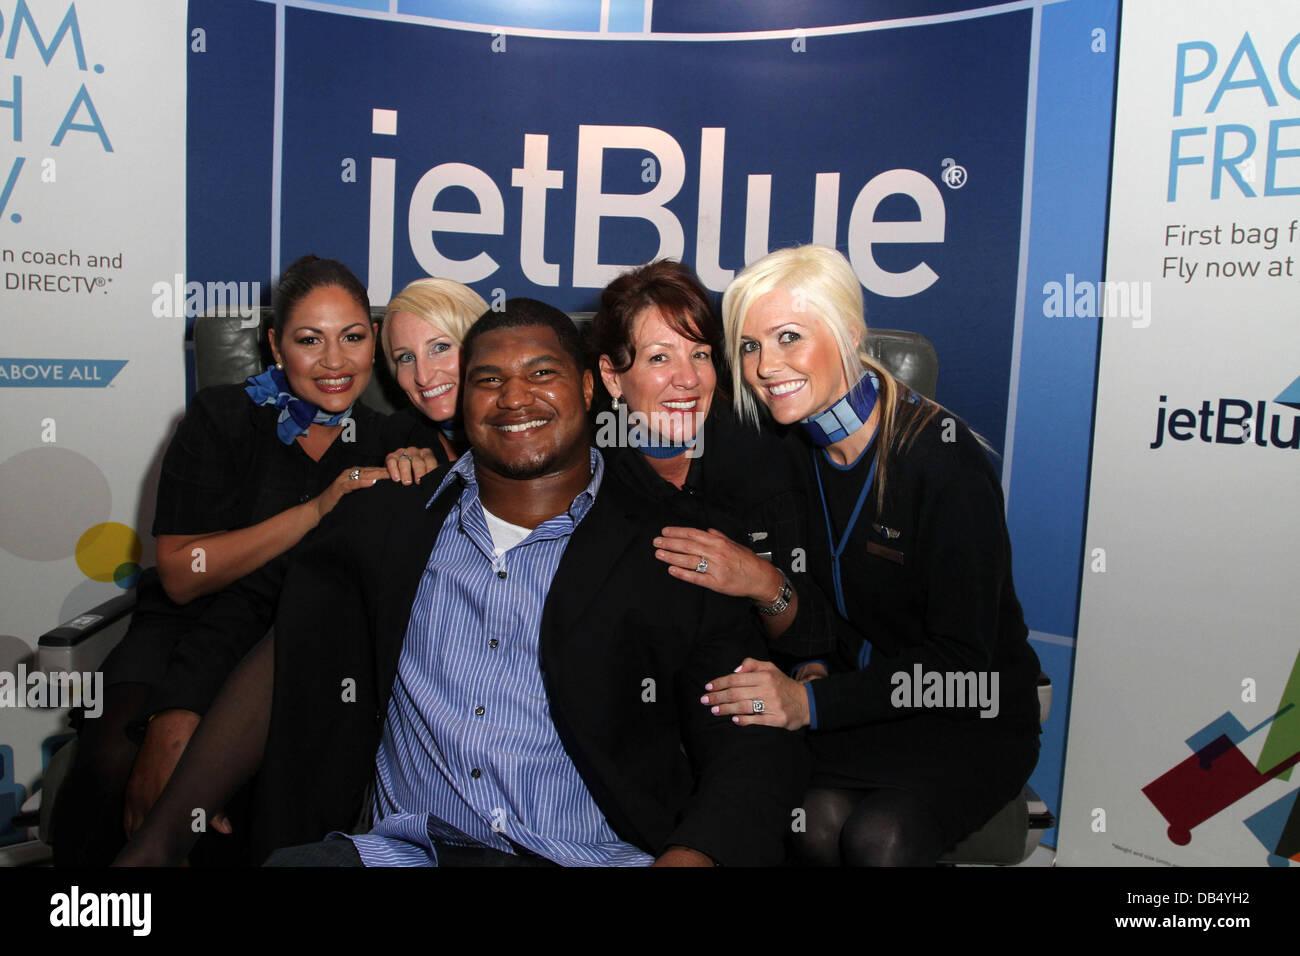 "Calais Campbell with Jet Blue Flight Attendants ""Pom Wonderful"